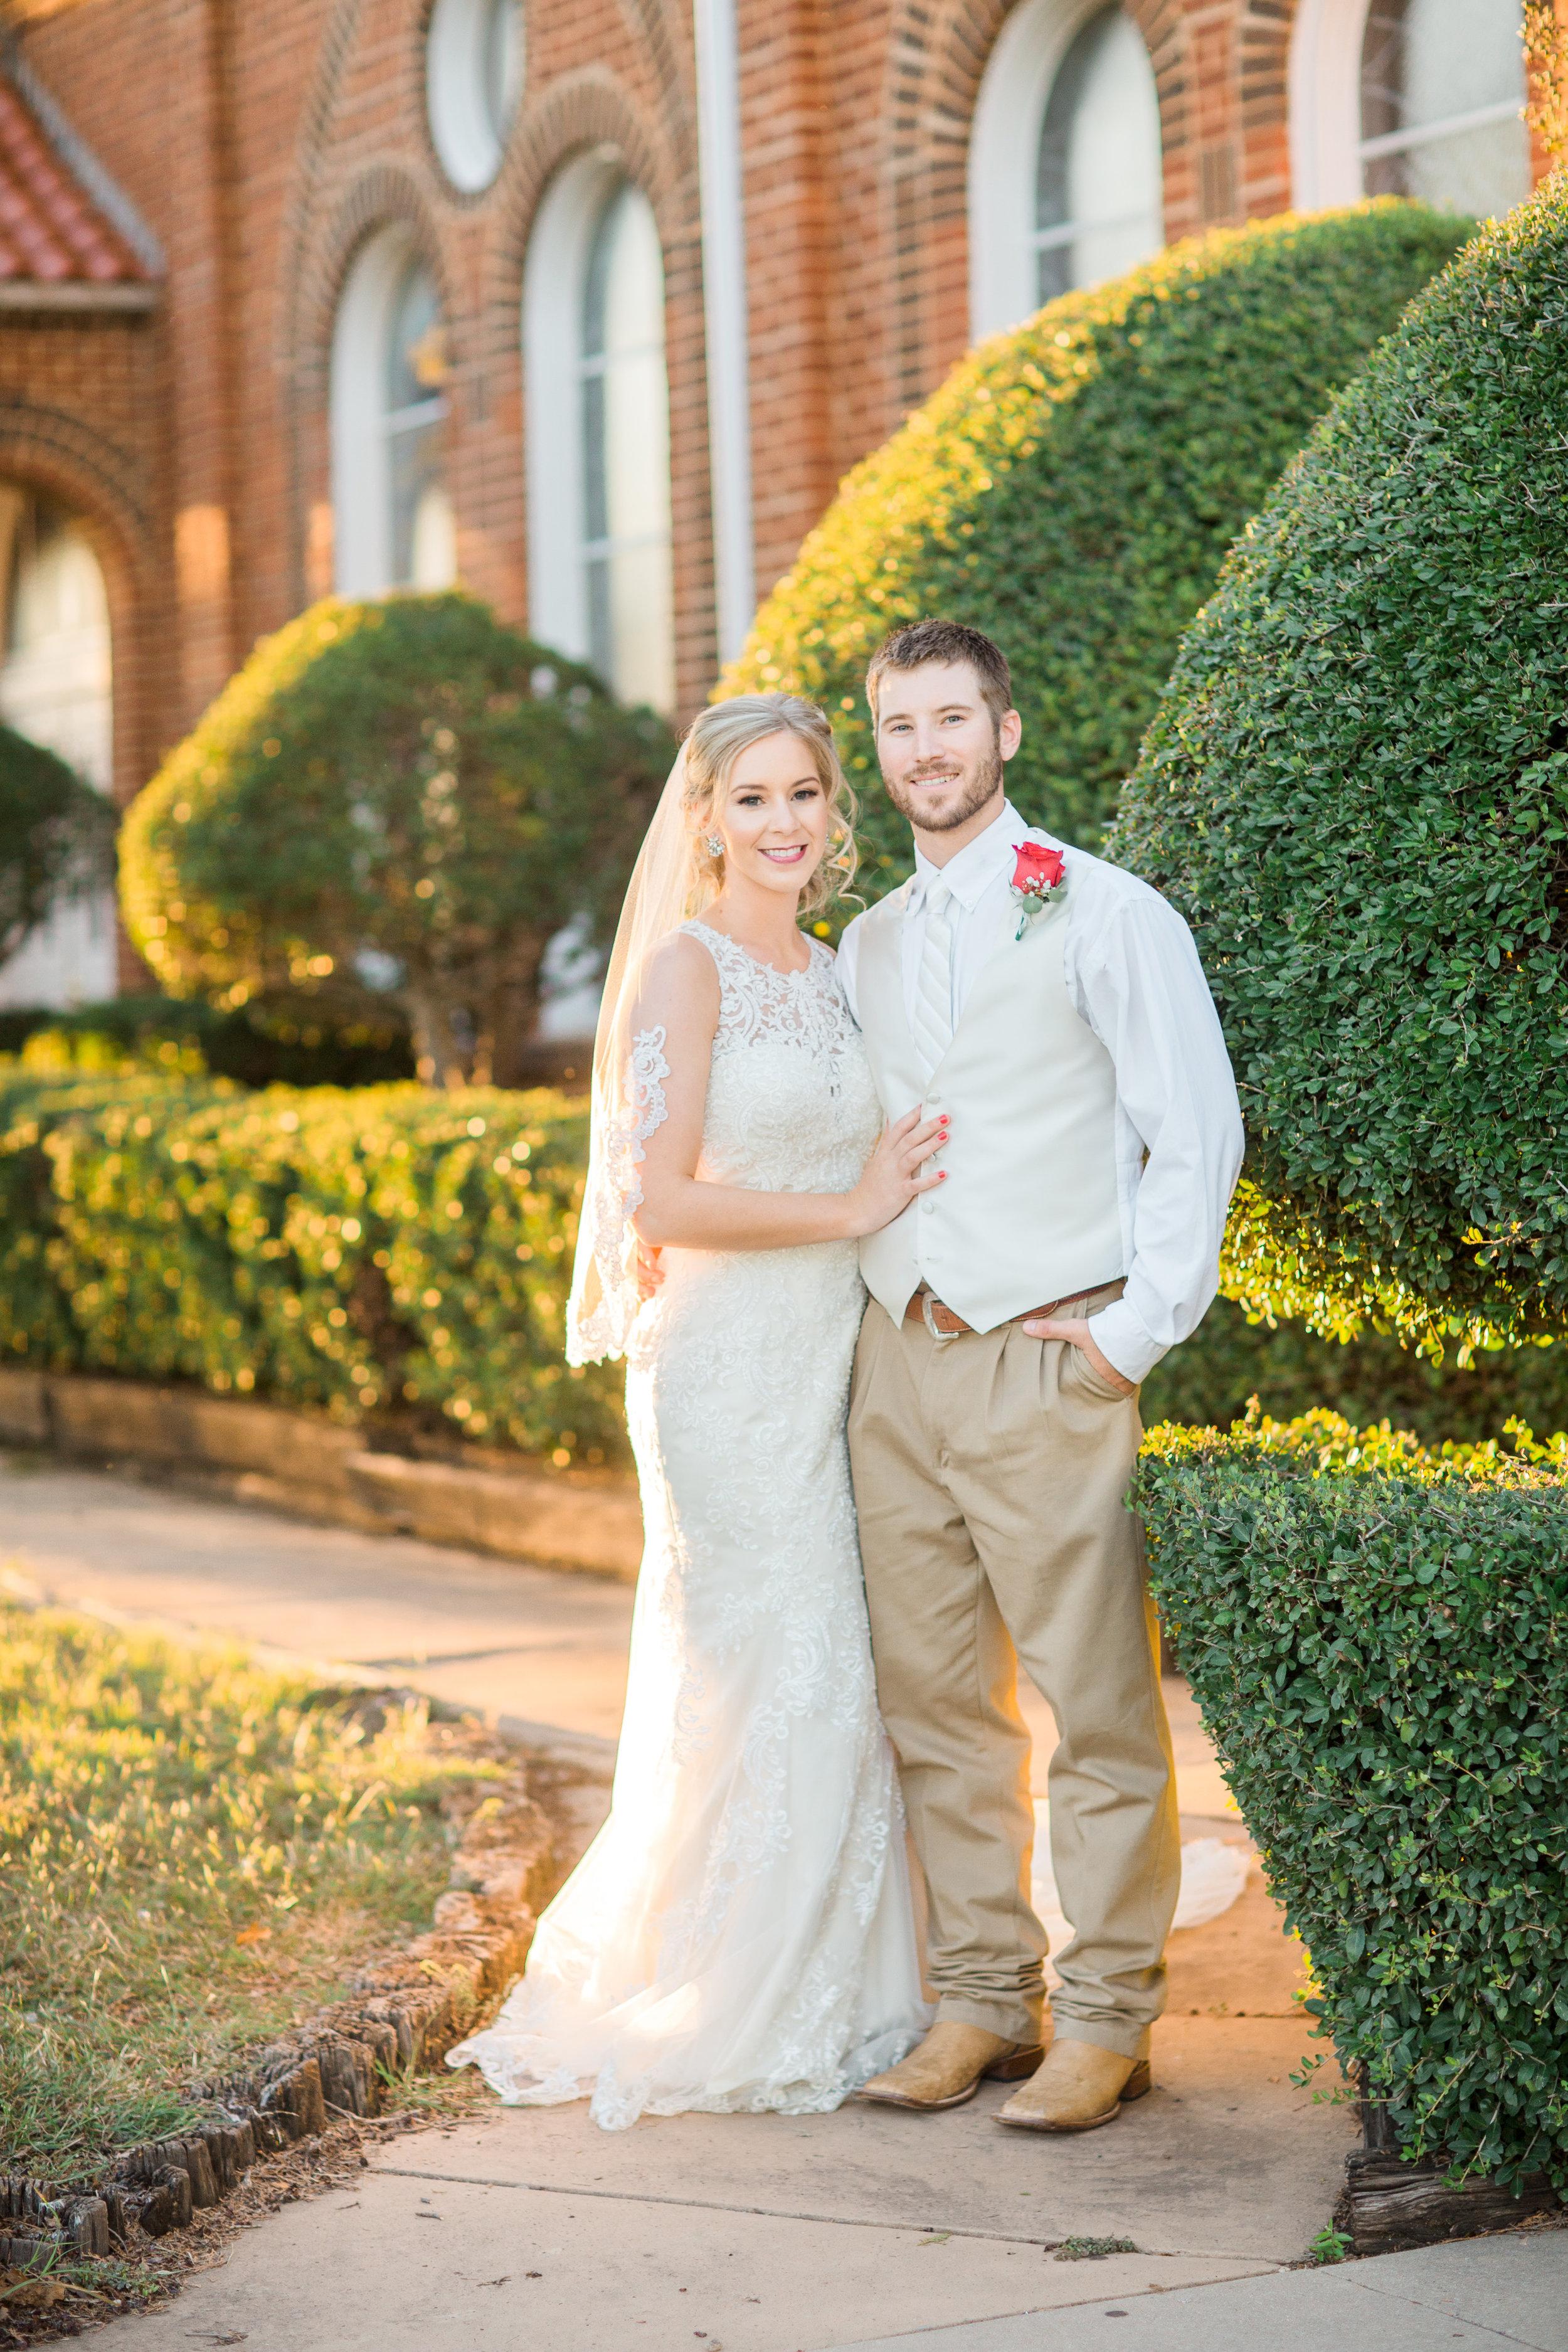 Bailey-Nathan-Windthorst-Texas-Wedding-056.jpg